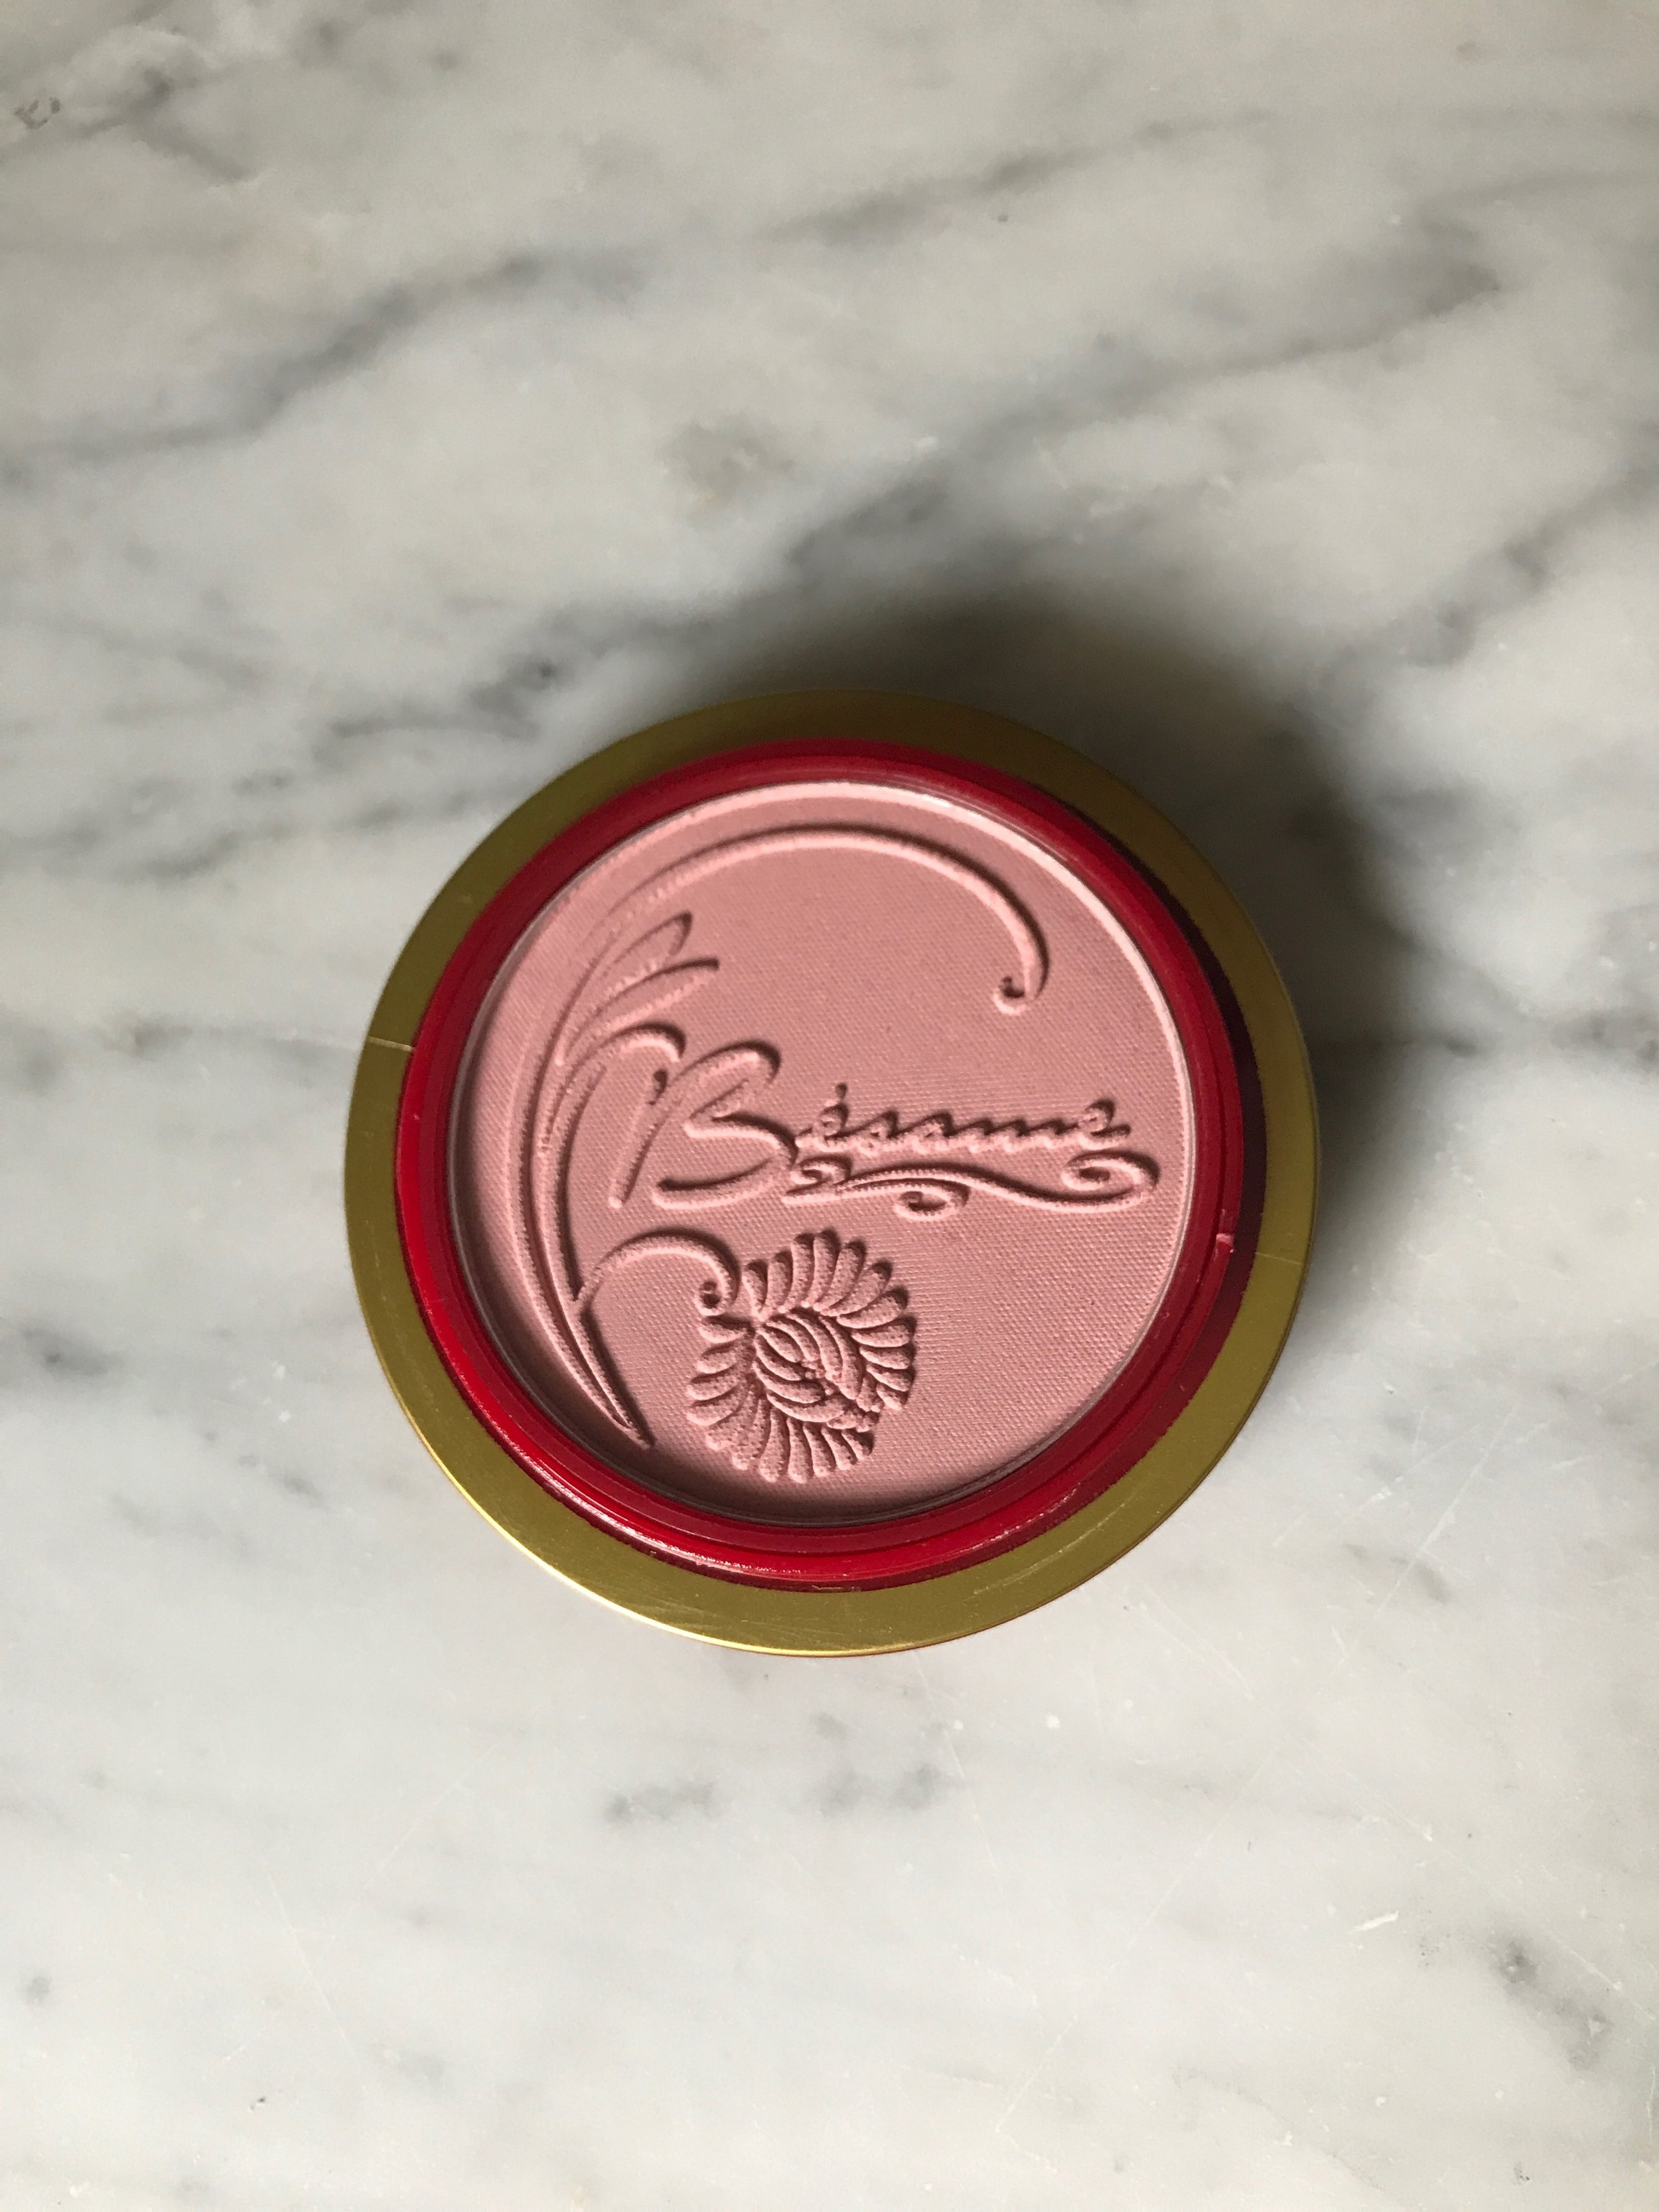 Besame Delicate Rogue in 'Sweet Pink'!